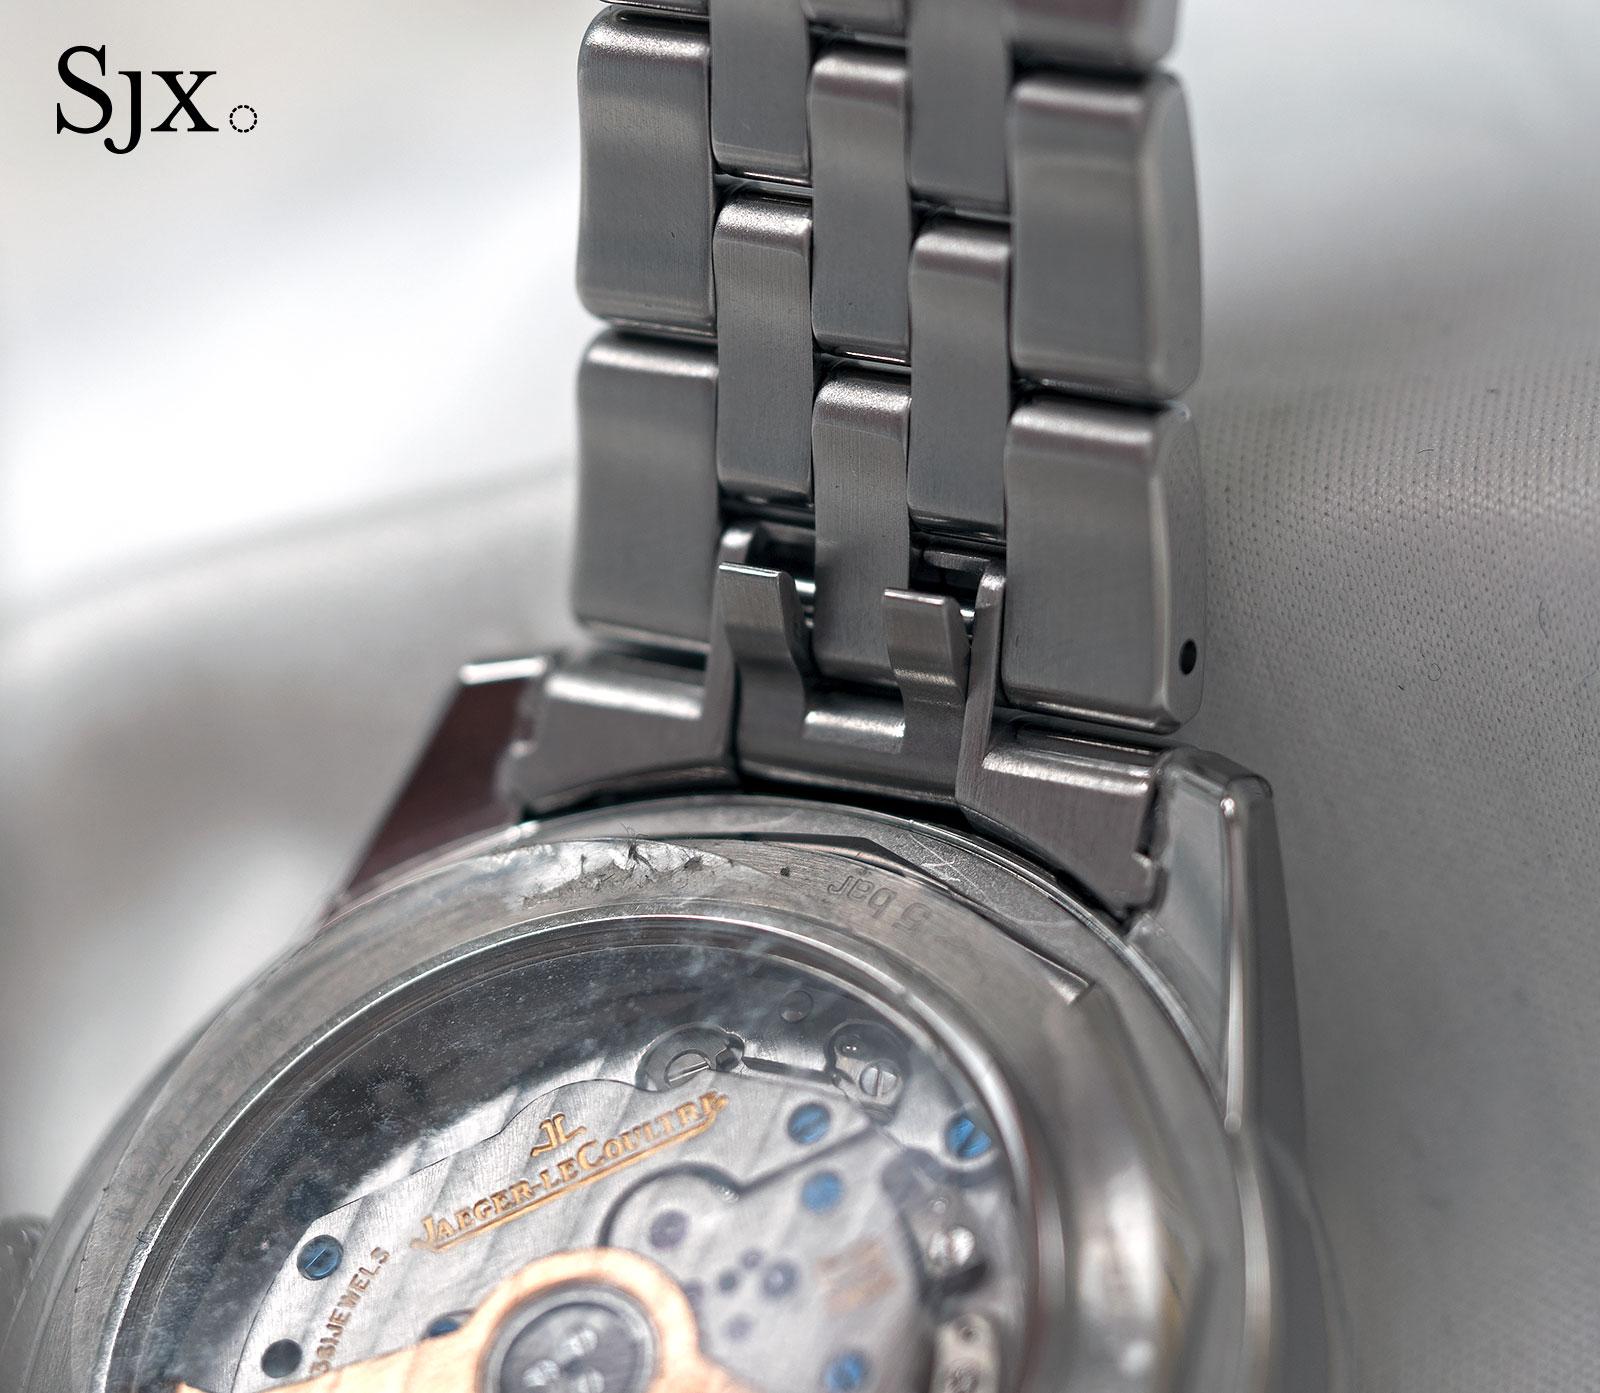 Jaeger-LeCoultre Geophysic Universal Time bracelet 1